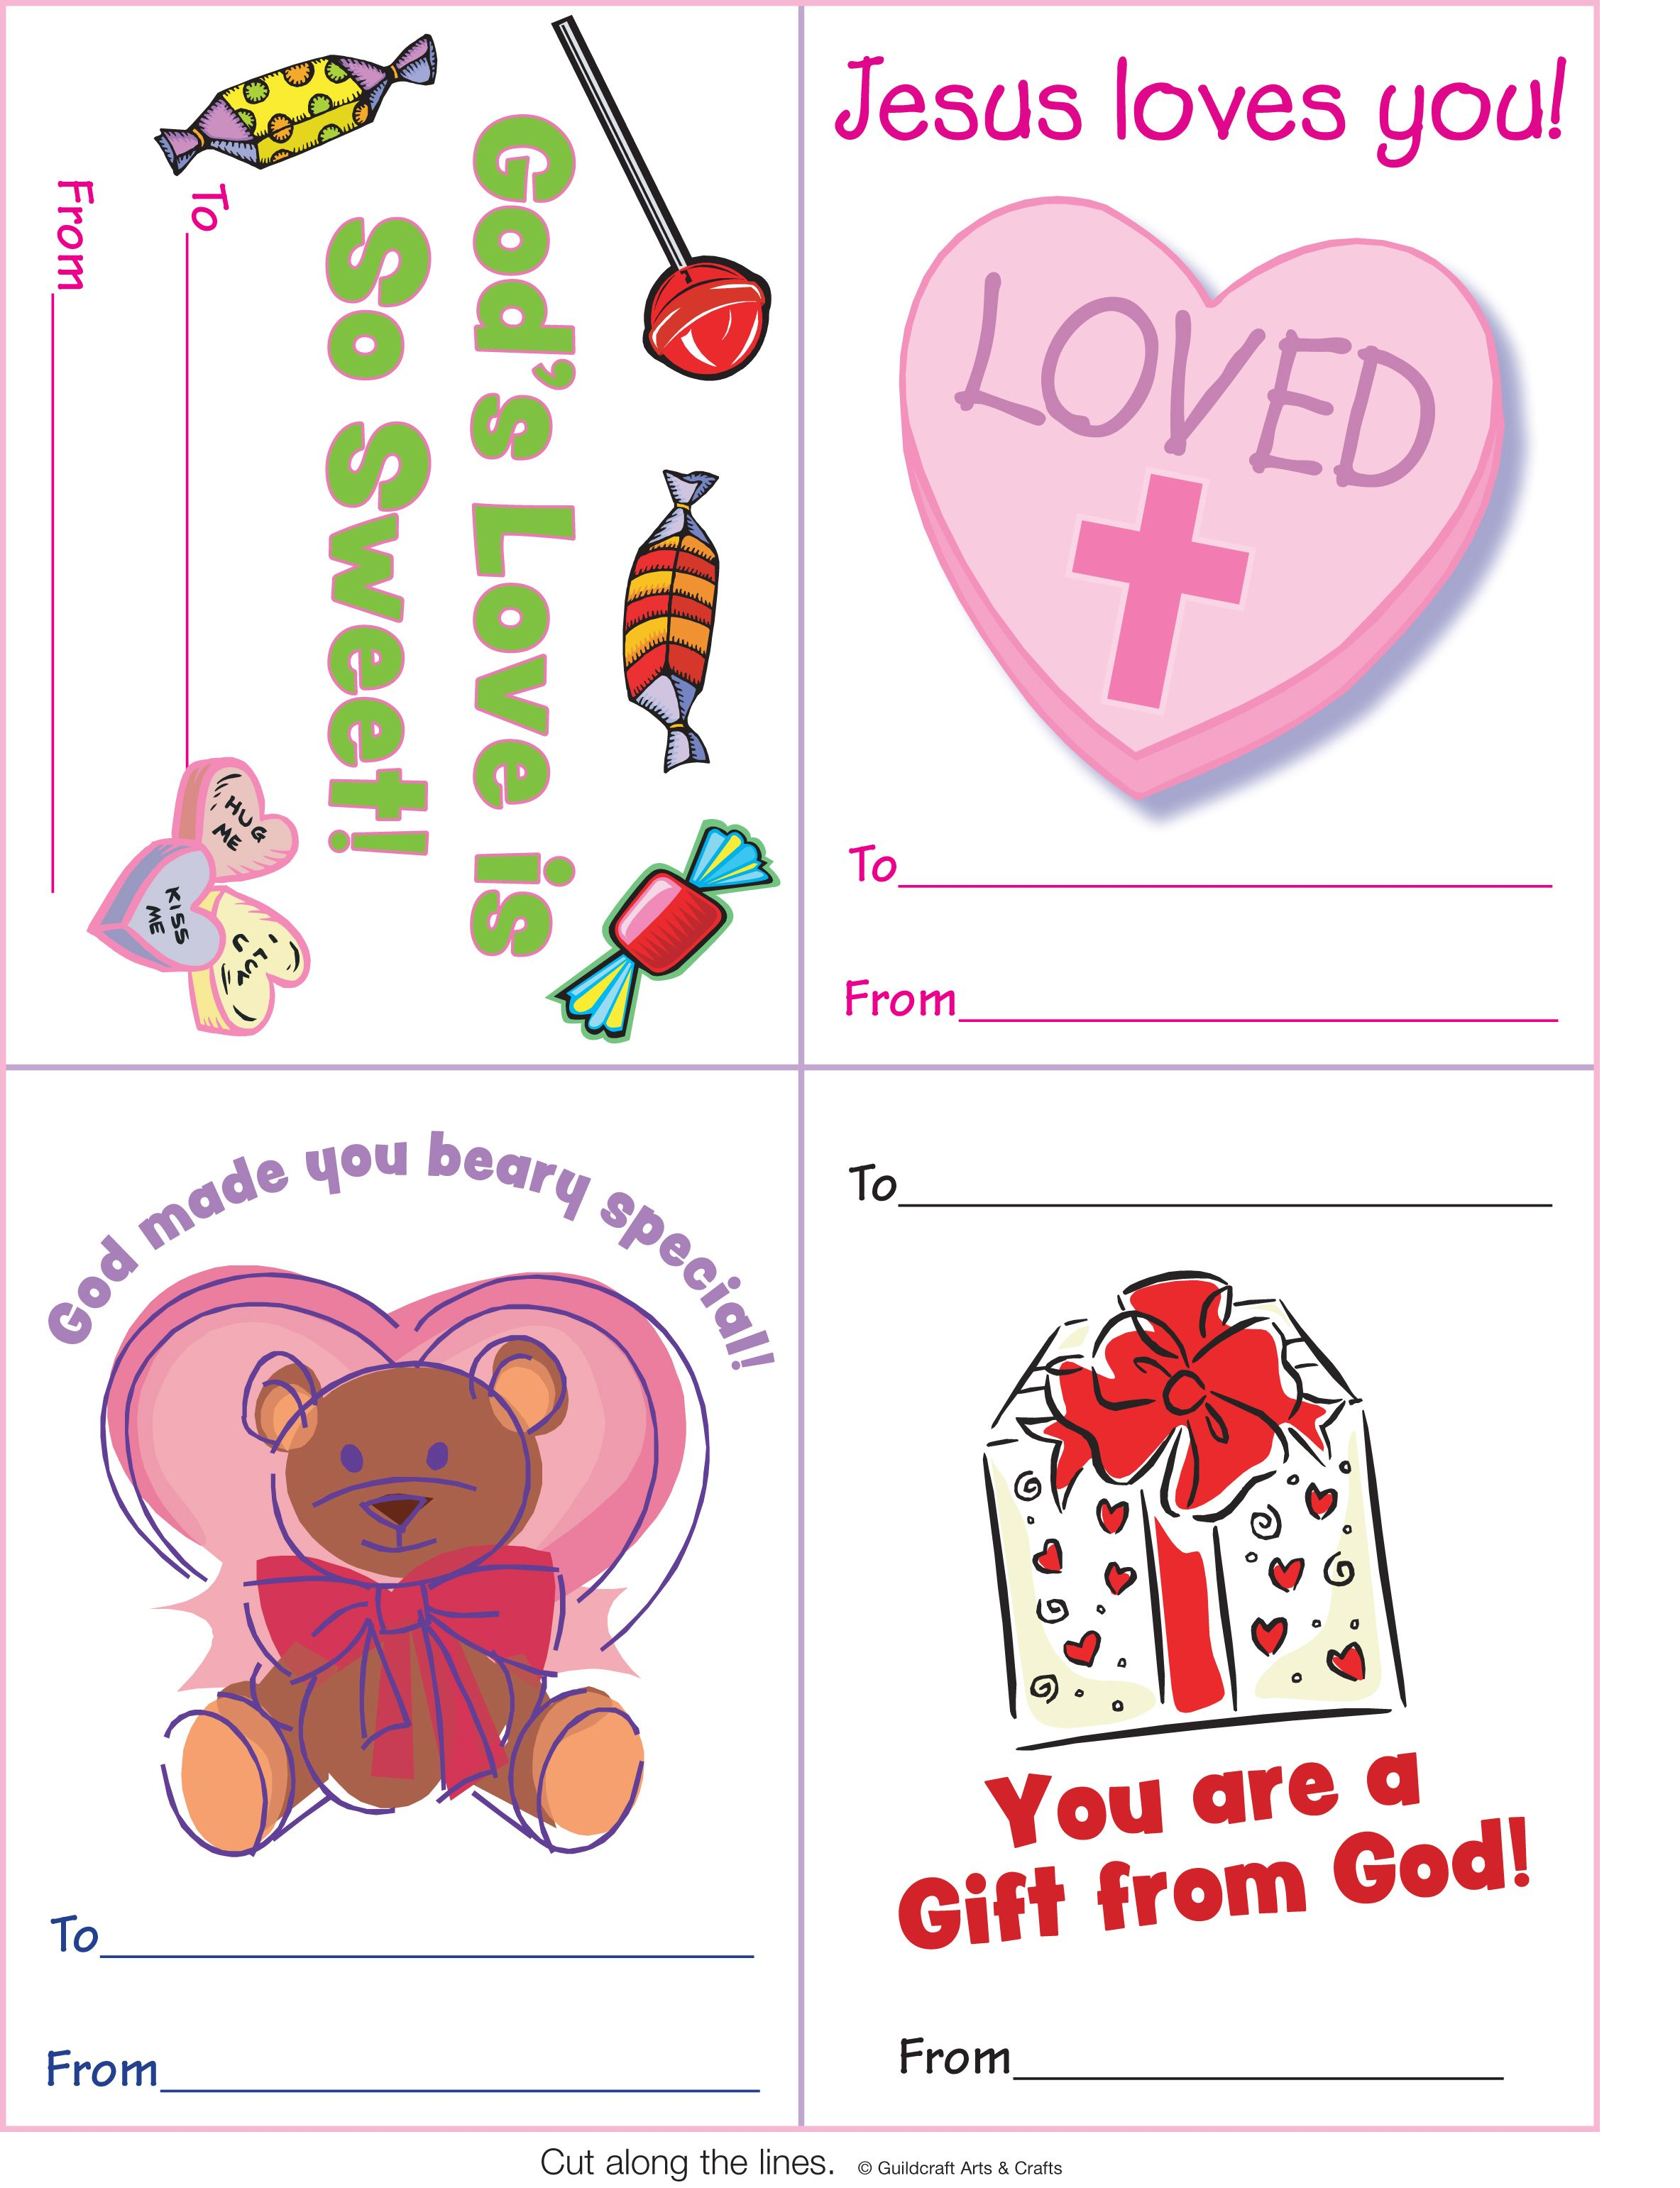 printable valentine 39 s day cards printables valentine 39 s day valentines day clipart. Black Bedroom Furniture Sets. Home Design Ideas